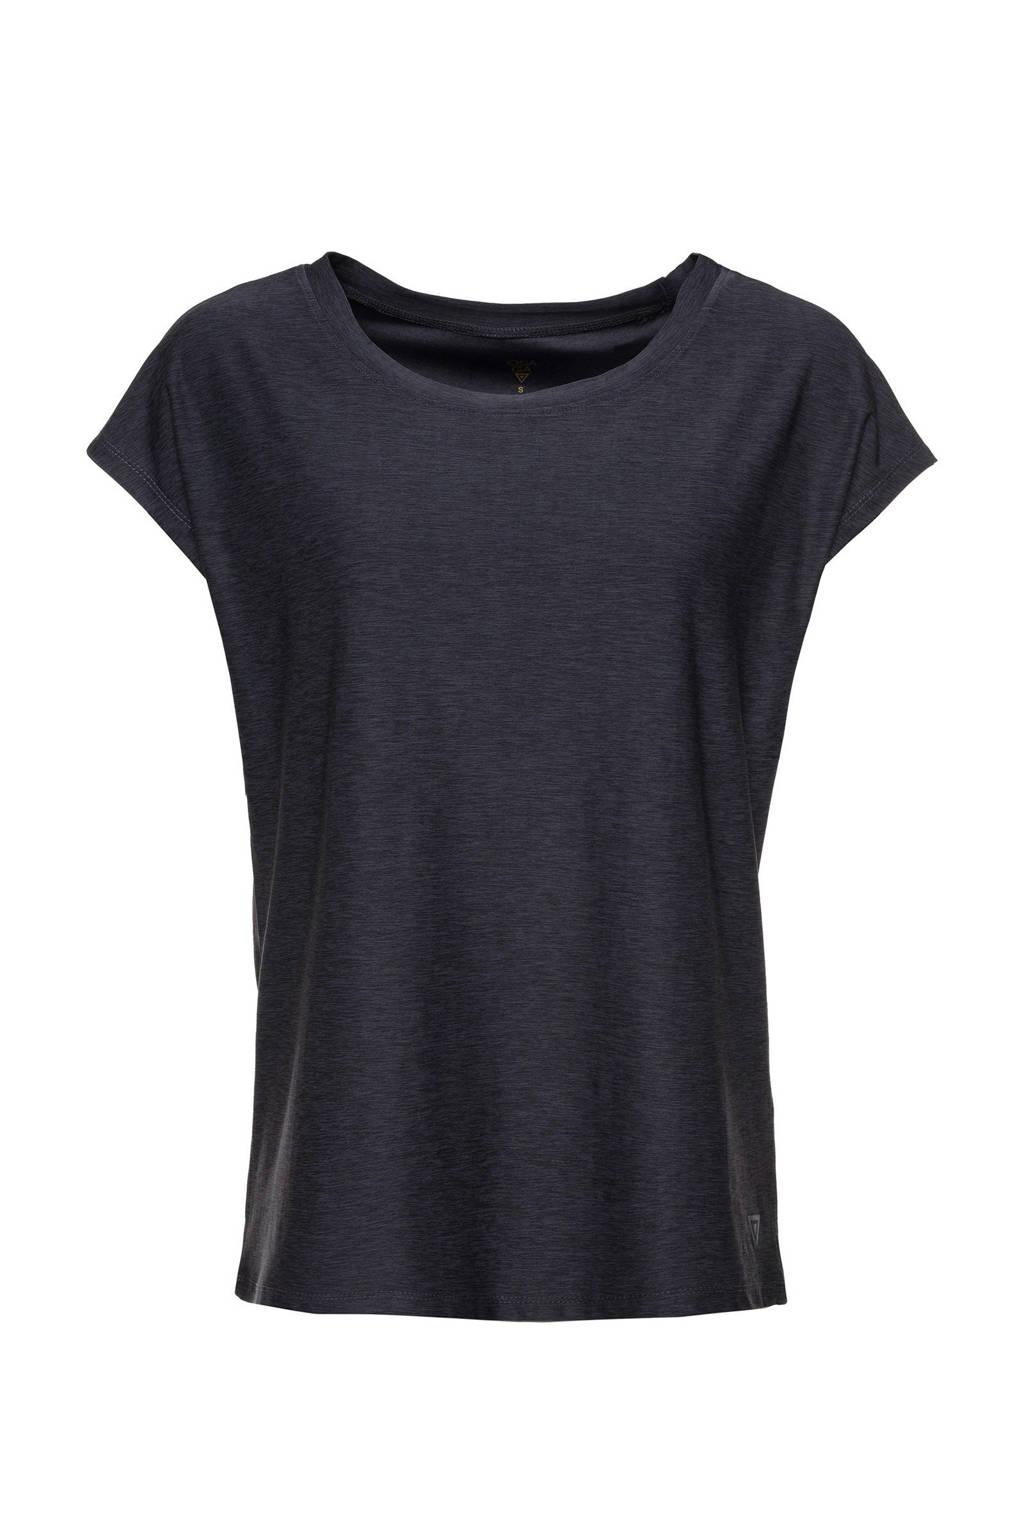 Scapino Osaga sport T-shirt grijs melange, Grijs melange